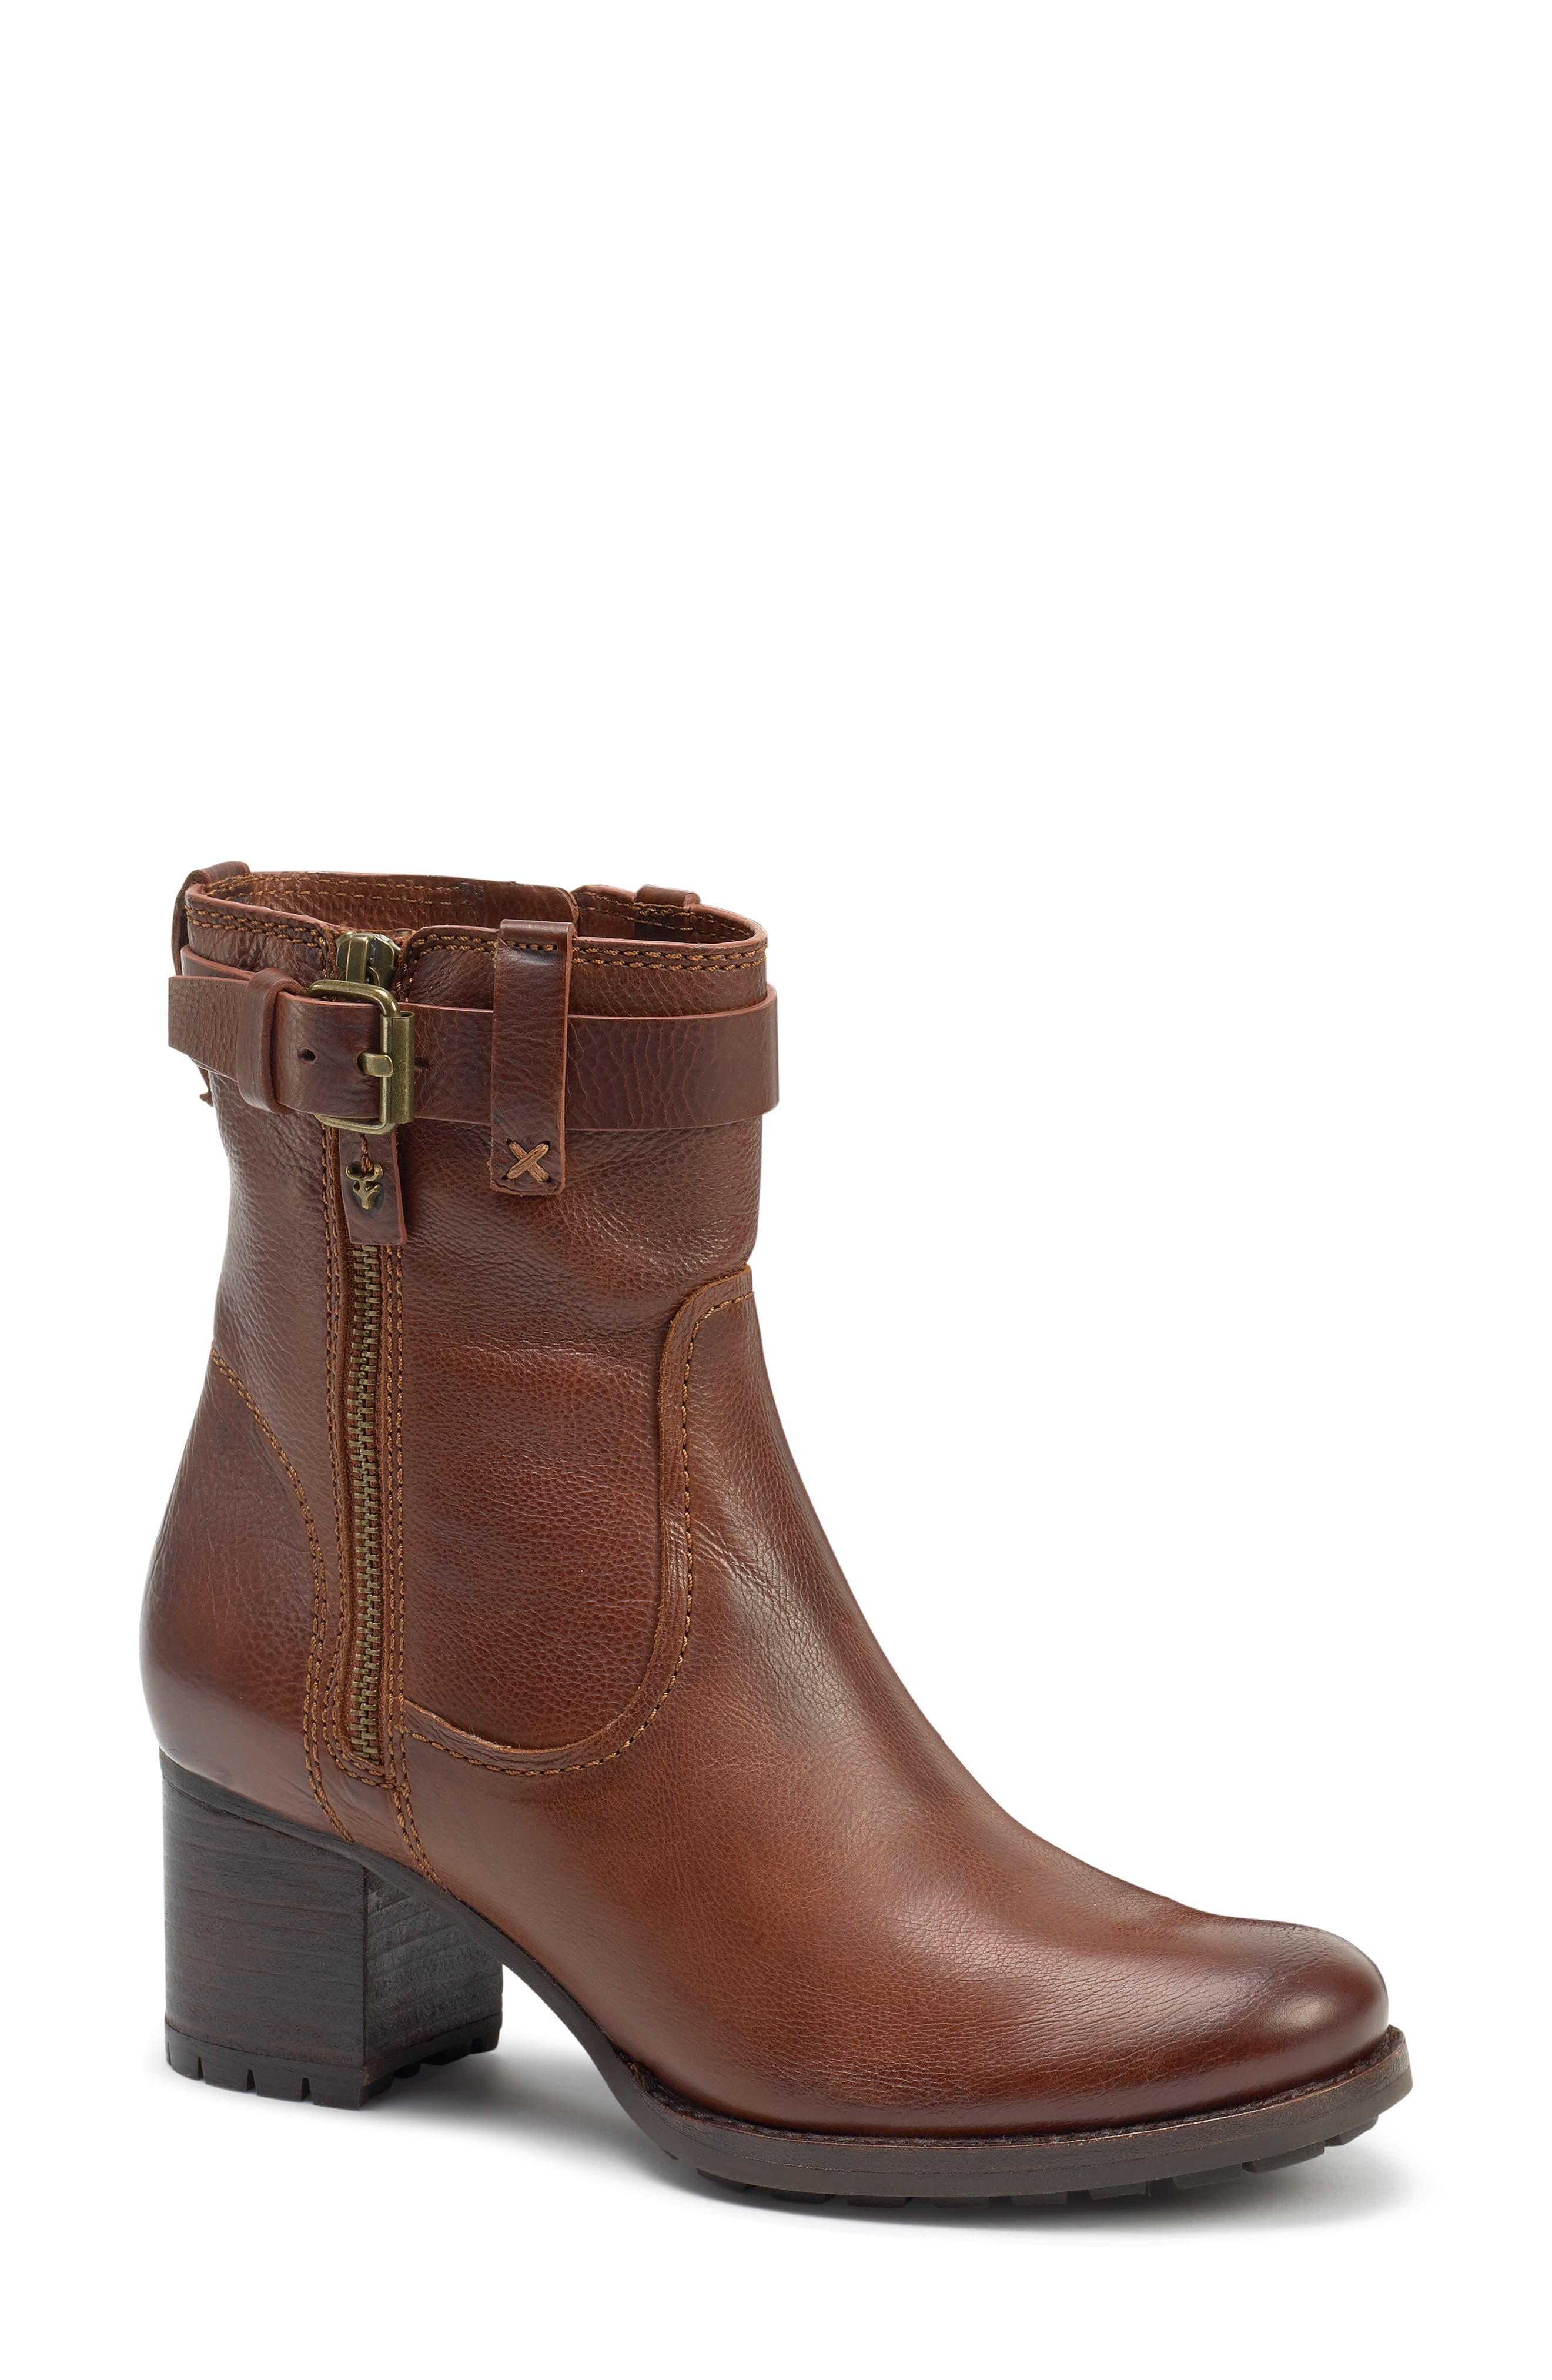 Trask Madison Waterproof Boot, Brown